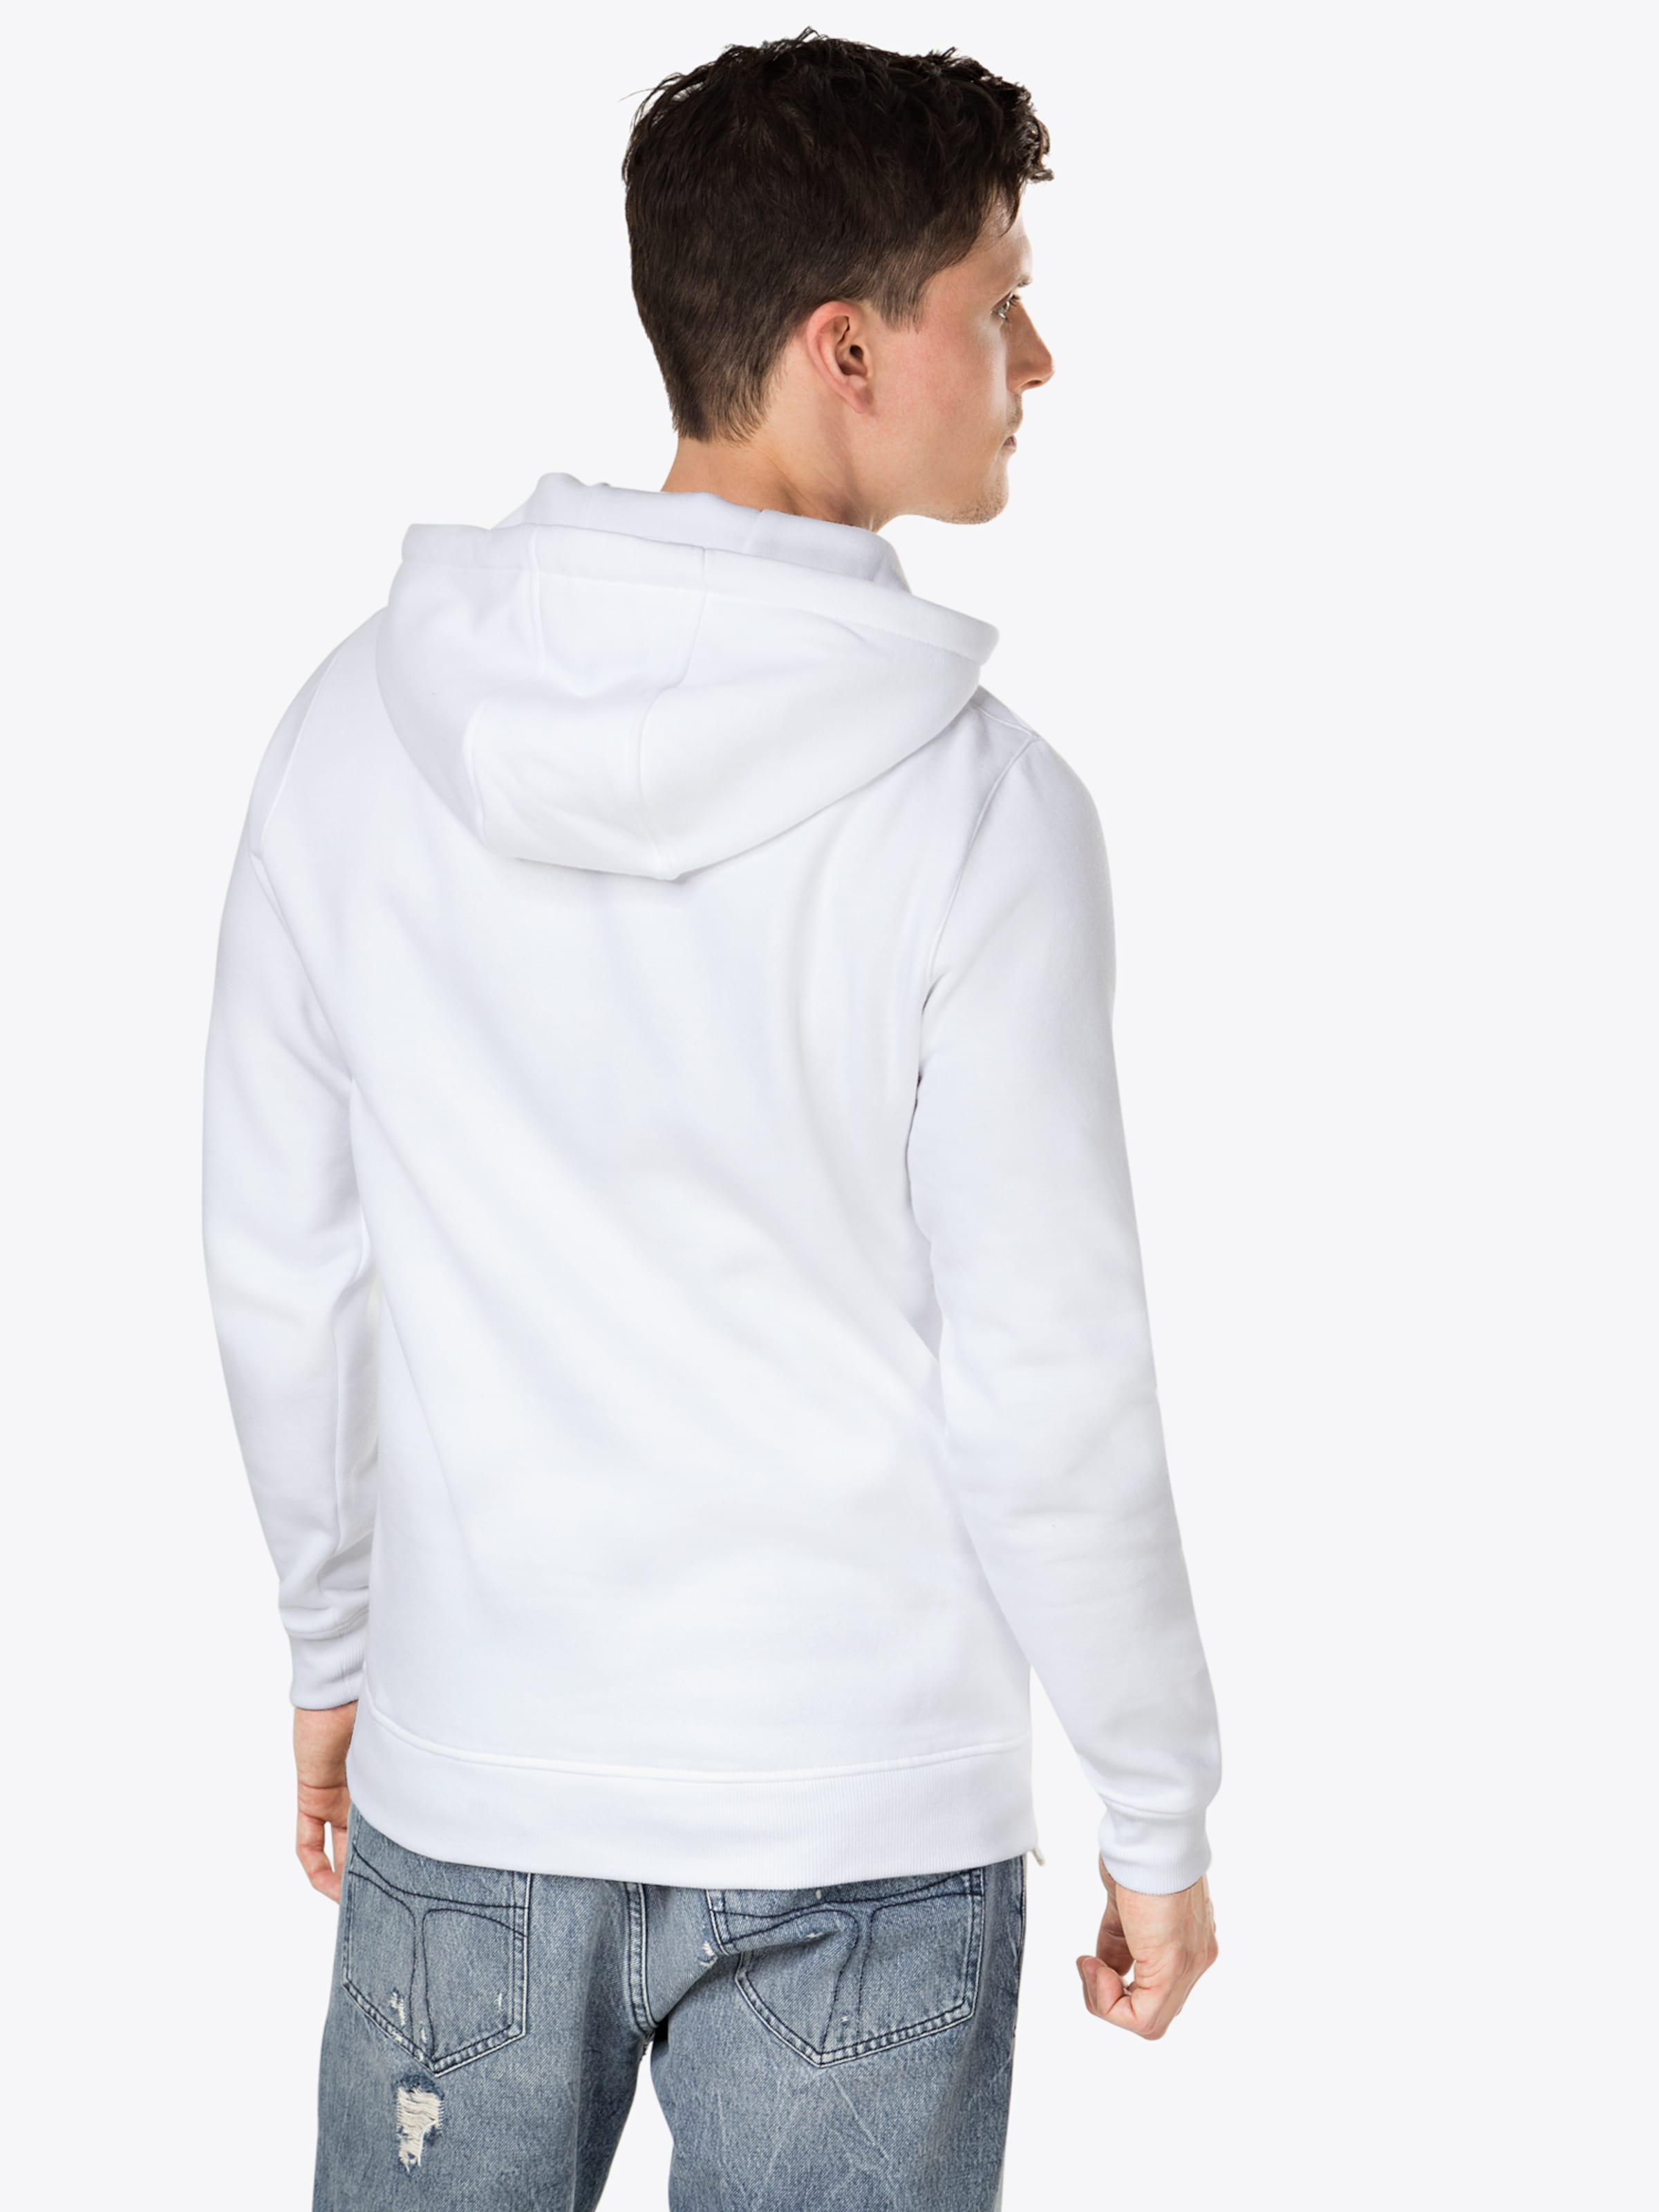 'nasa' Sweat En BleuRouge Blanc Tee Mister shirt 9HED2I